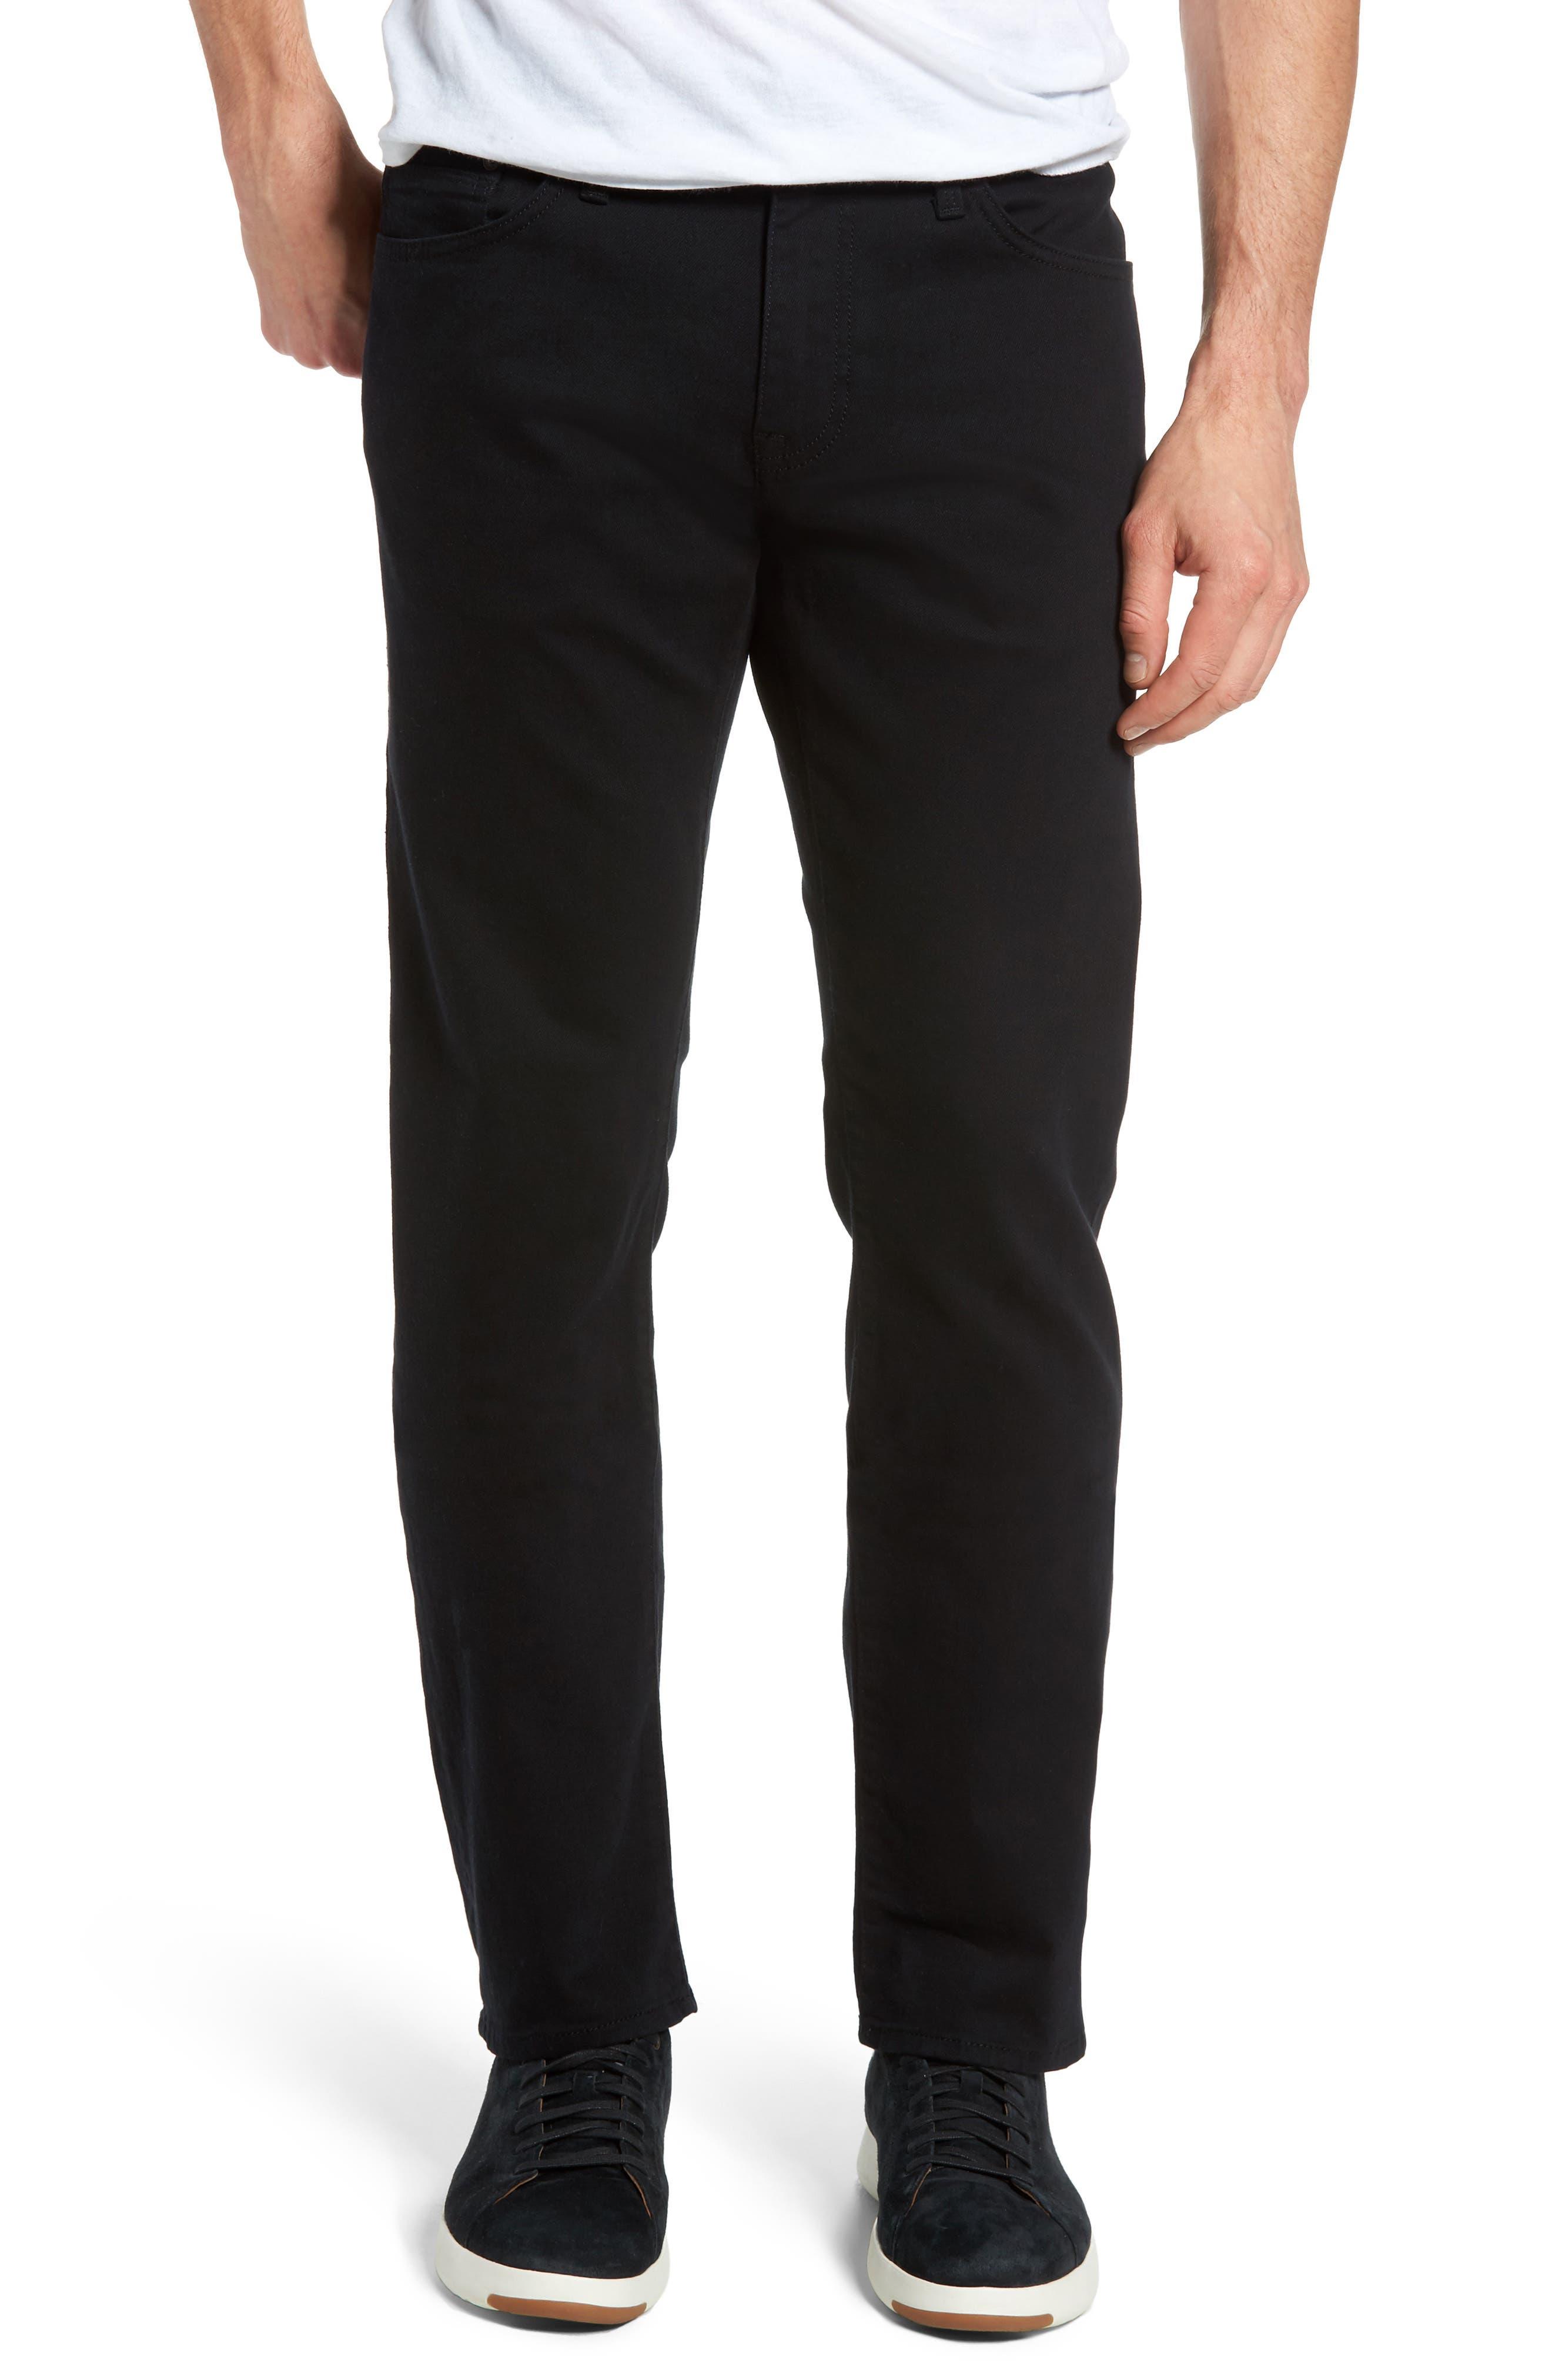 Zach Straight Leg Jeans,                         Main,                         color, BLACK WILLIAMSBURG